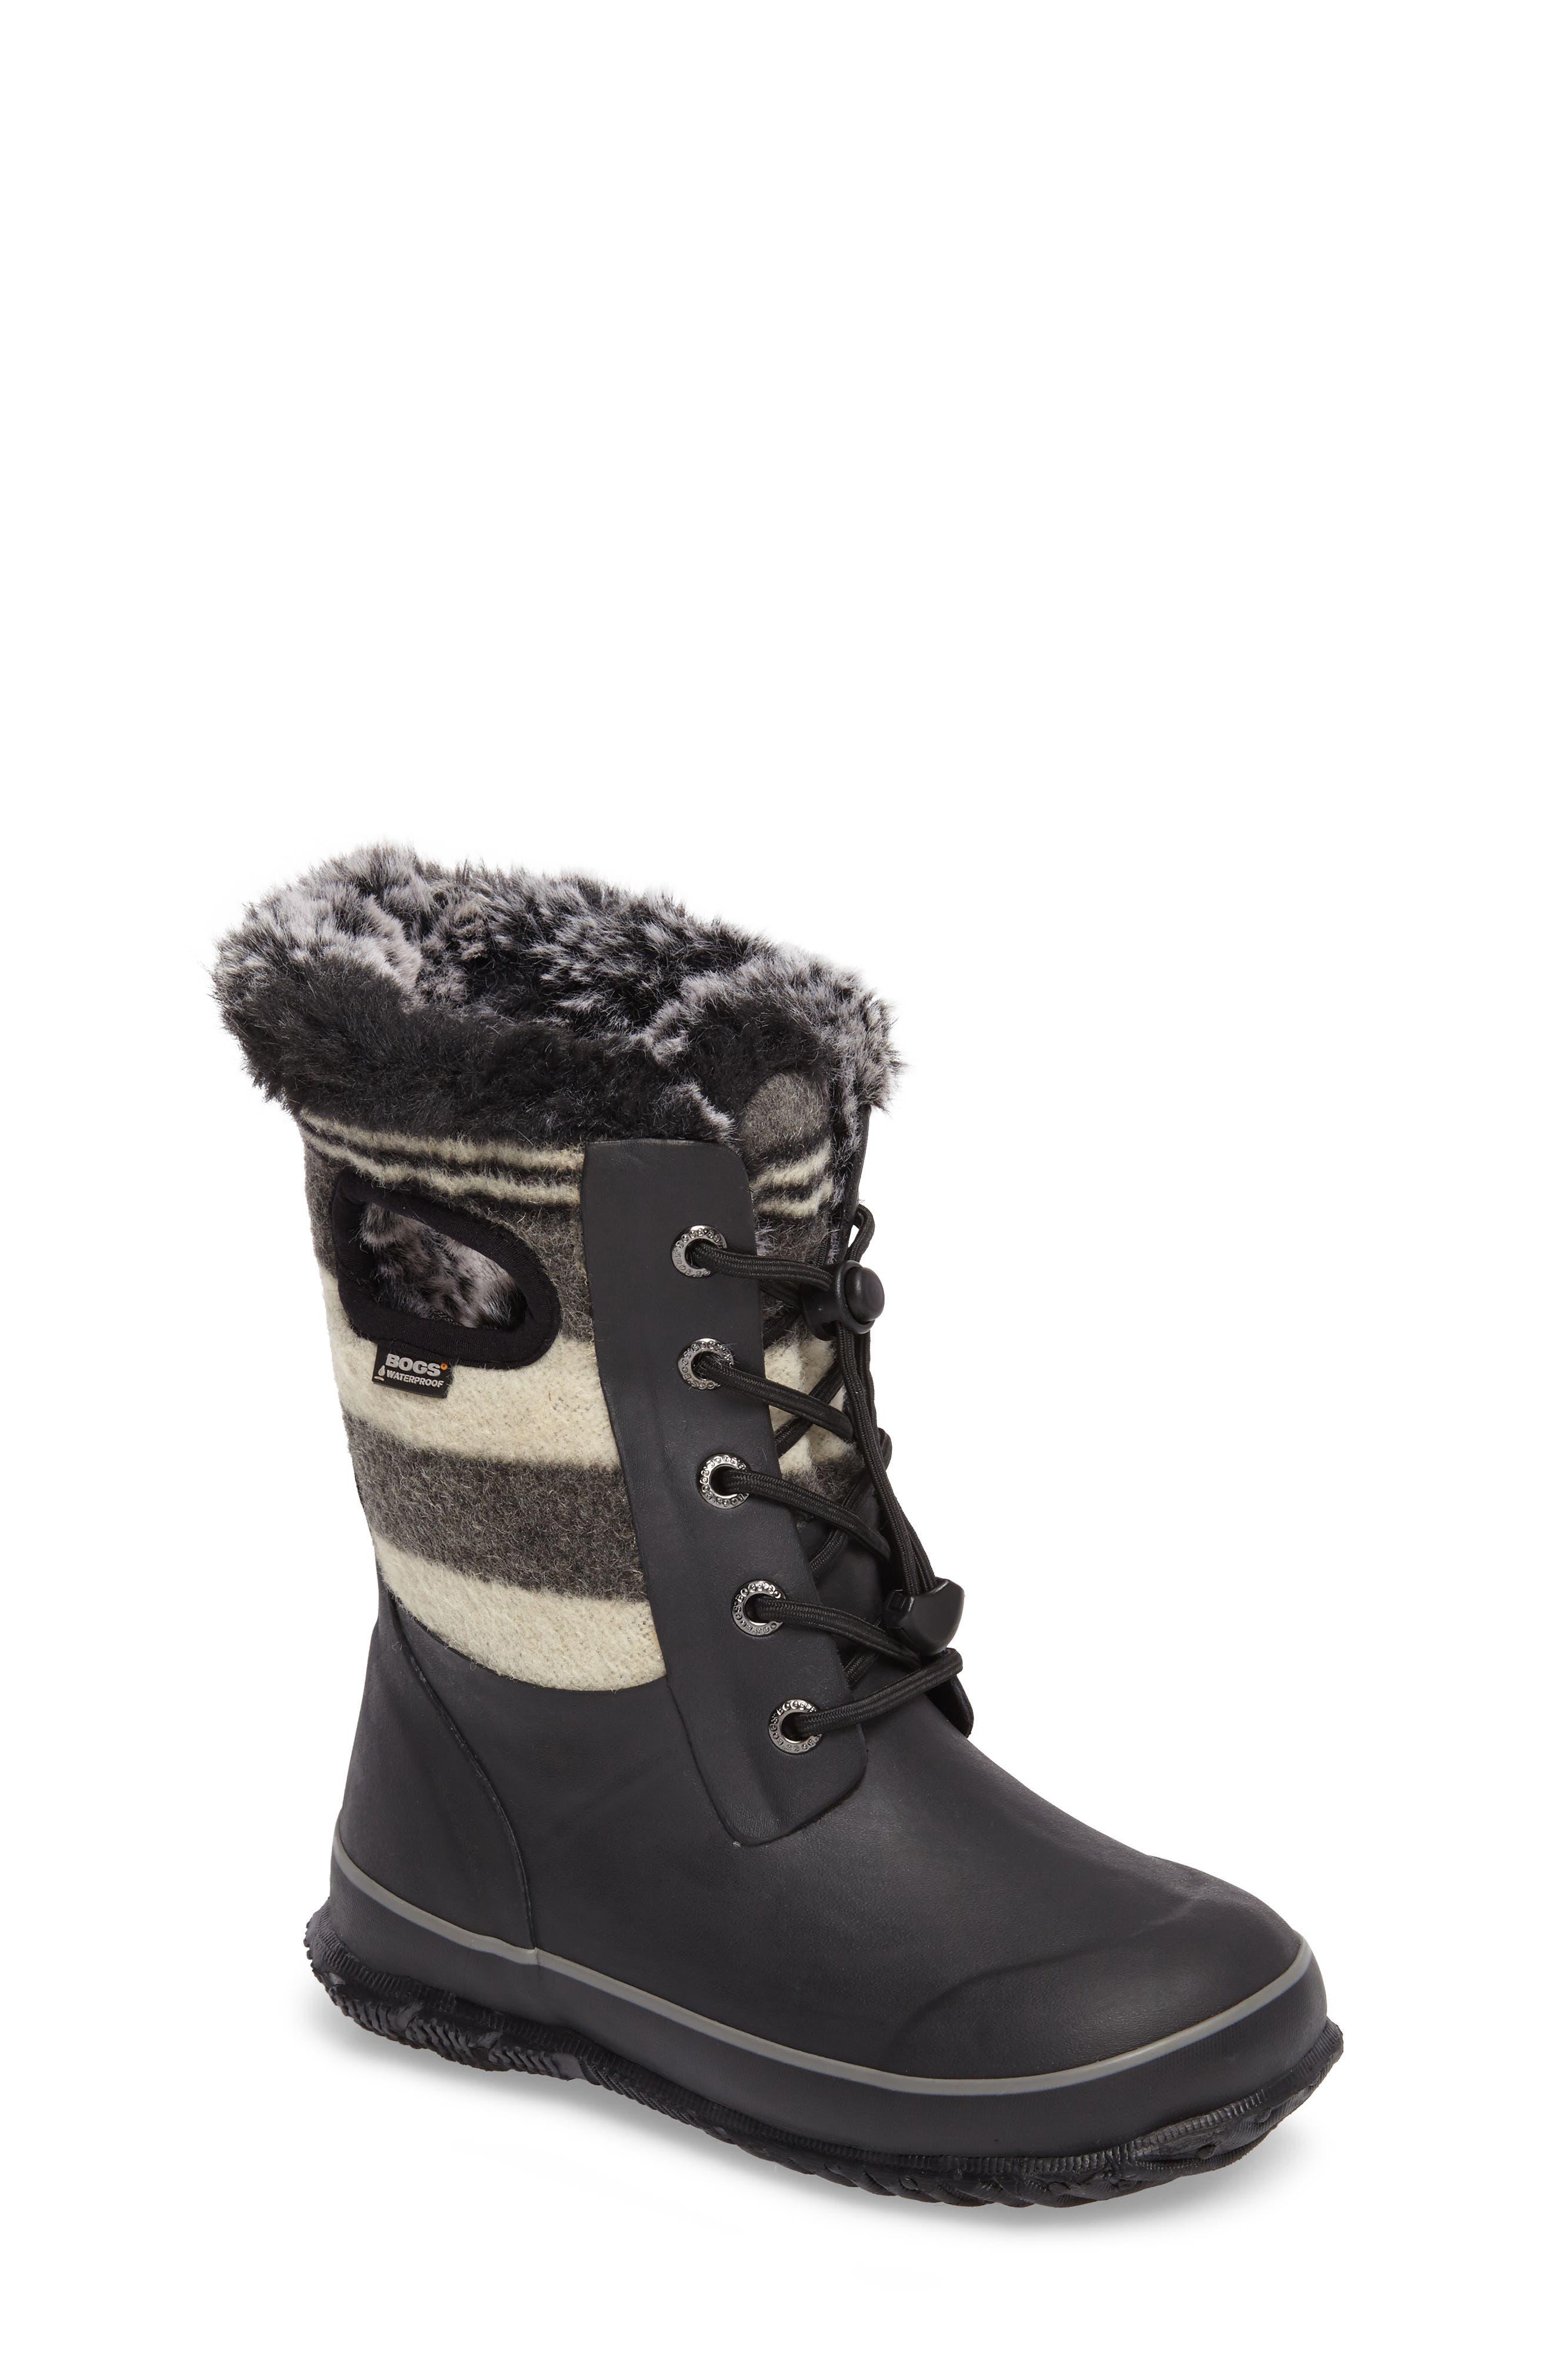 Main Image - Bogs Arcata Stripe Waterproof Insulated Faux Fur Boot (Walker, Toddler, Little Kid & Big Kid)